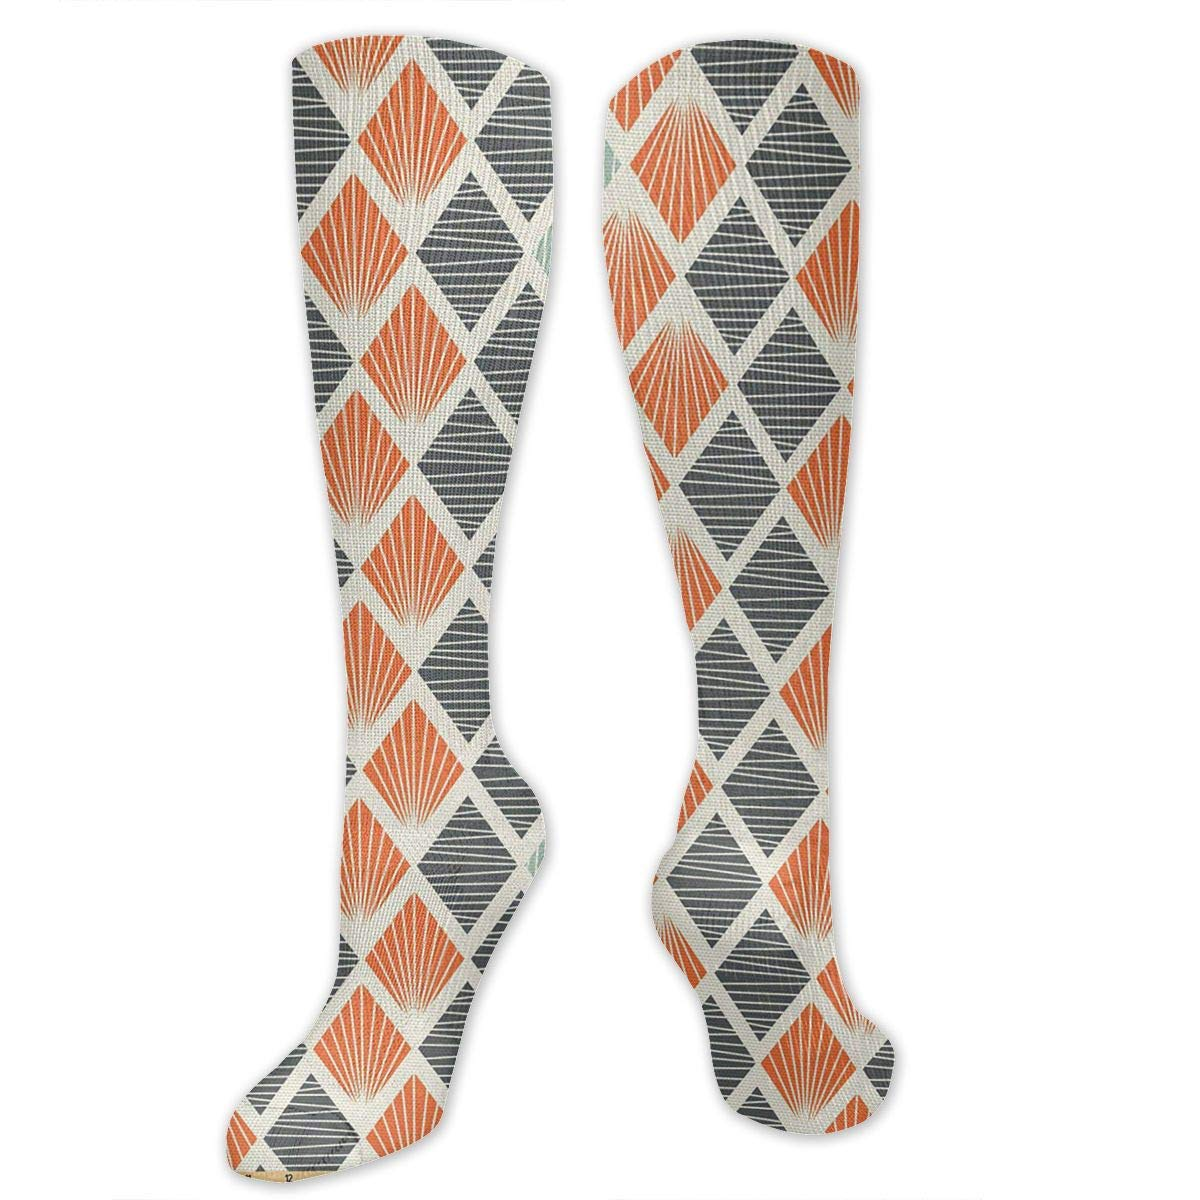 Chanwazibibiliu Pop Art Style Retro Rhombus Fractal Mens Colorful Dress Socks Funky Men Multicolored Pattern Fashionable Fun Crew Cotton Socks